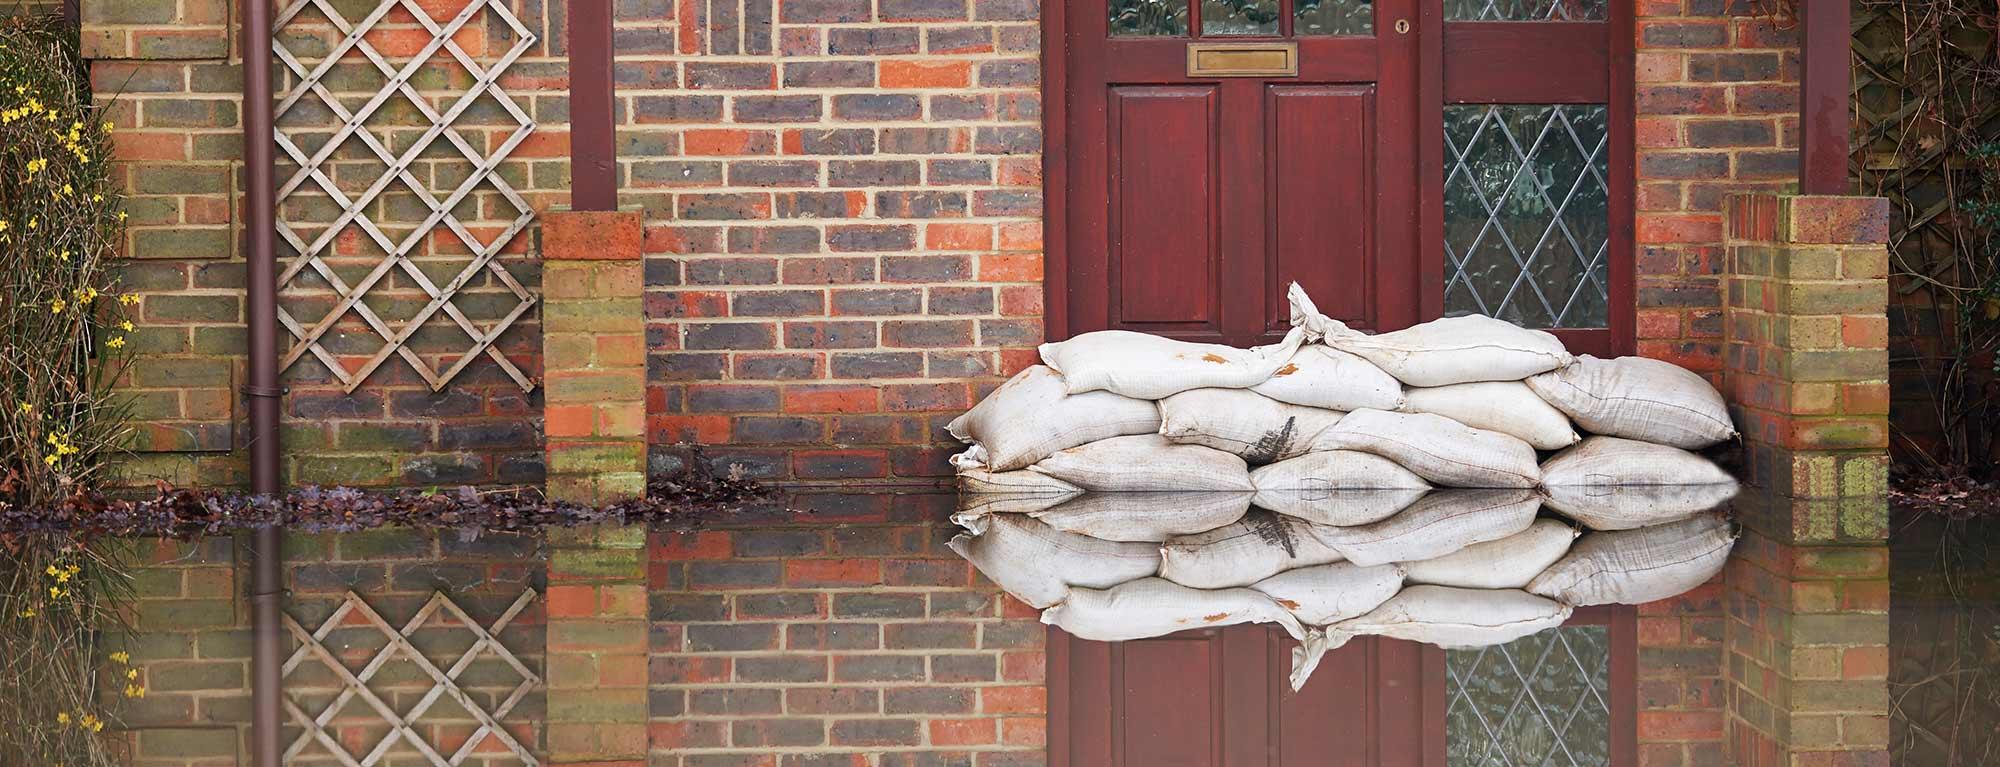 Insurance Market, Flooding devastation